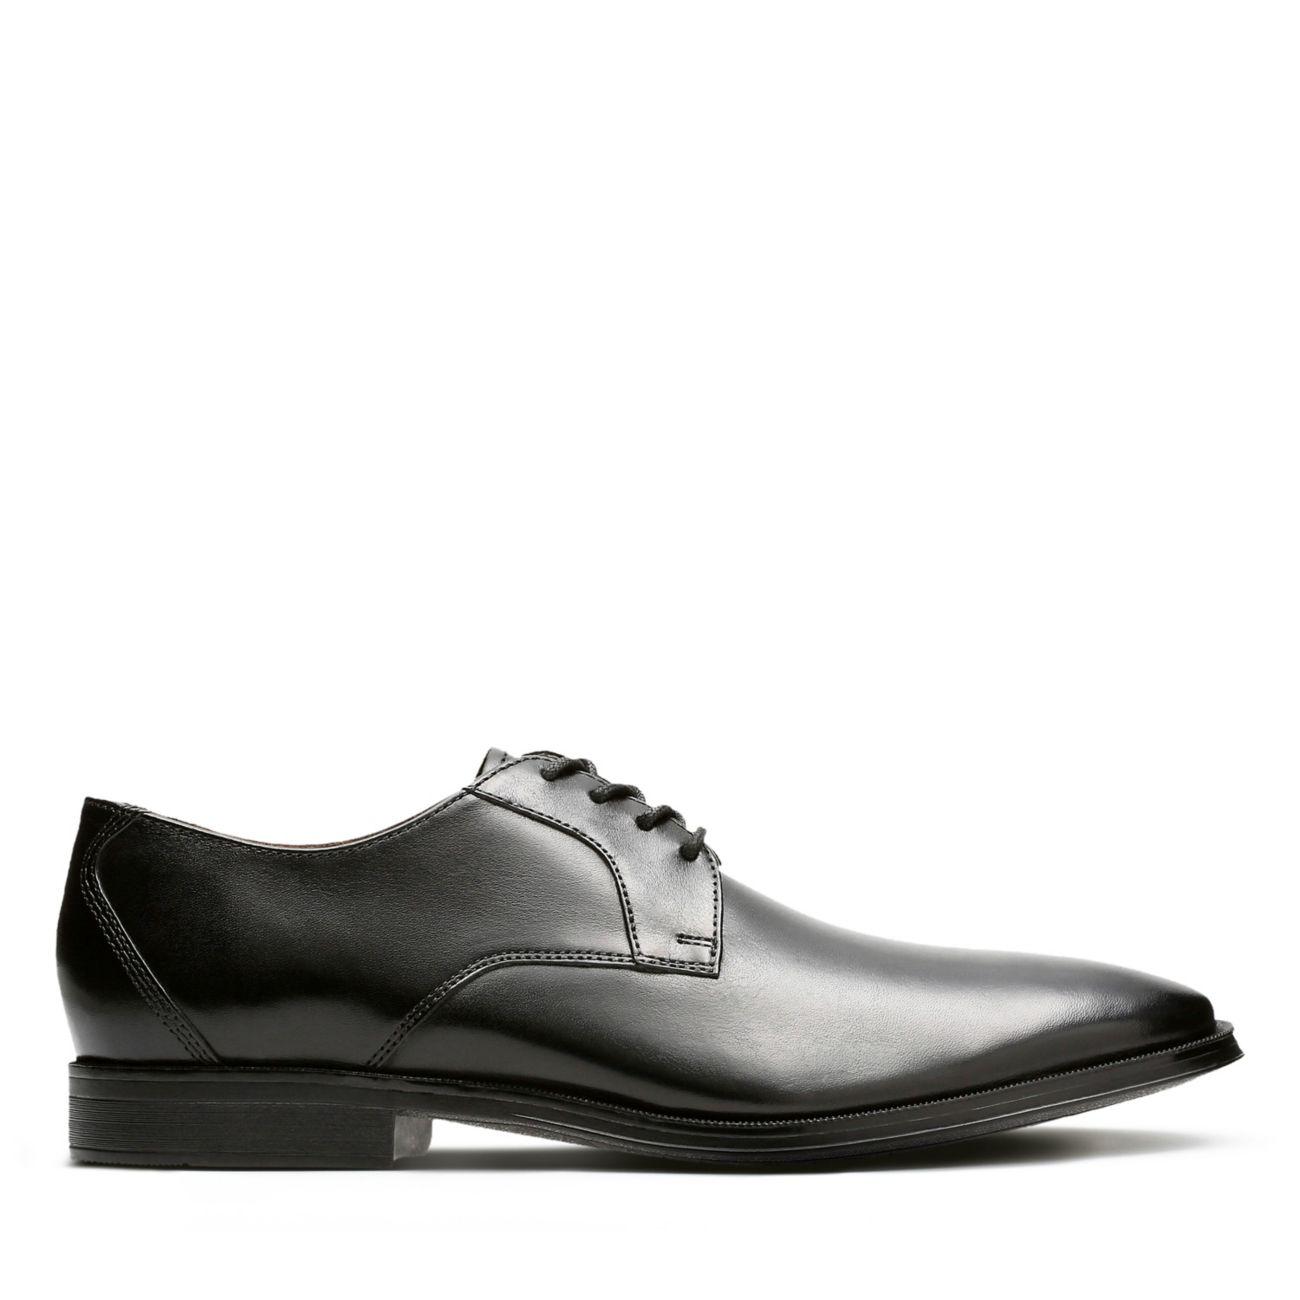 285ea916313894 Gilman Lace Black Leather - Mens Oxford Shoes - Clarks® Shoes Official Site    Clarks